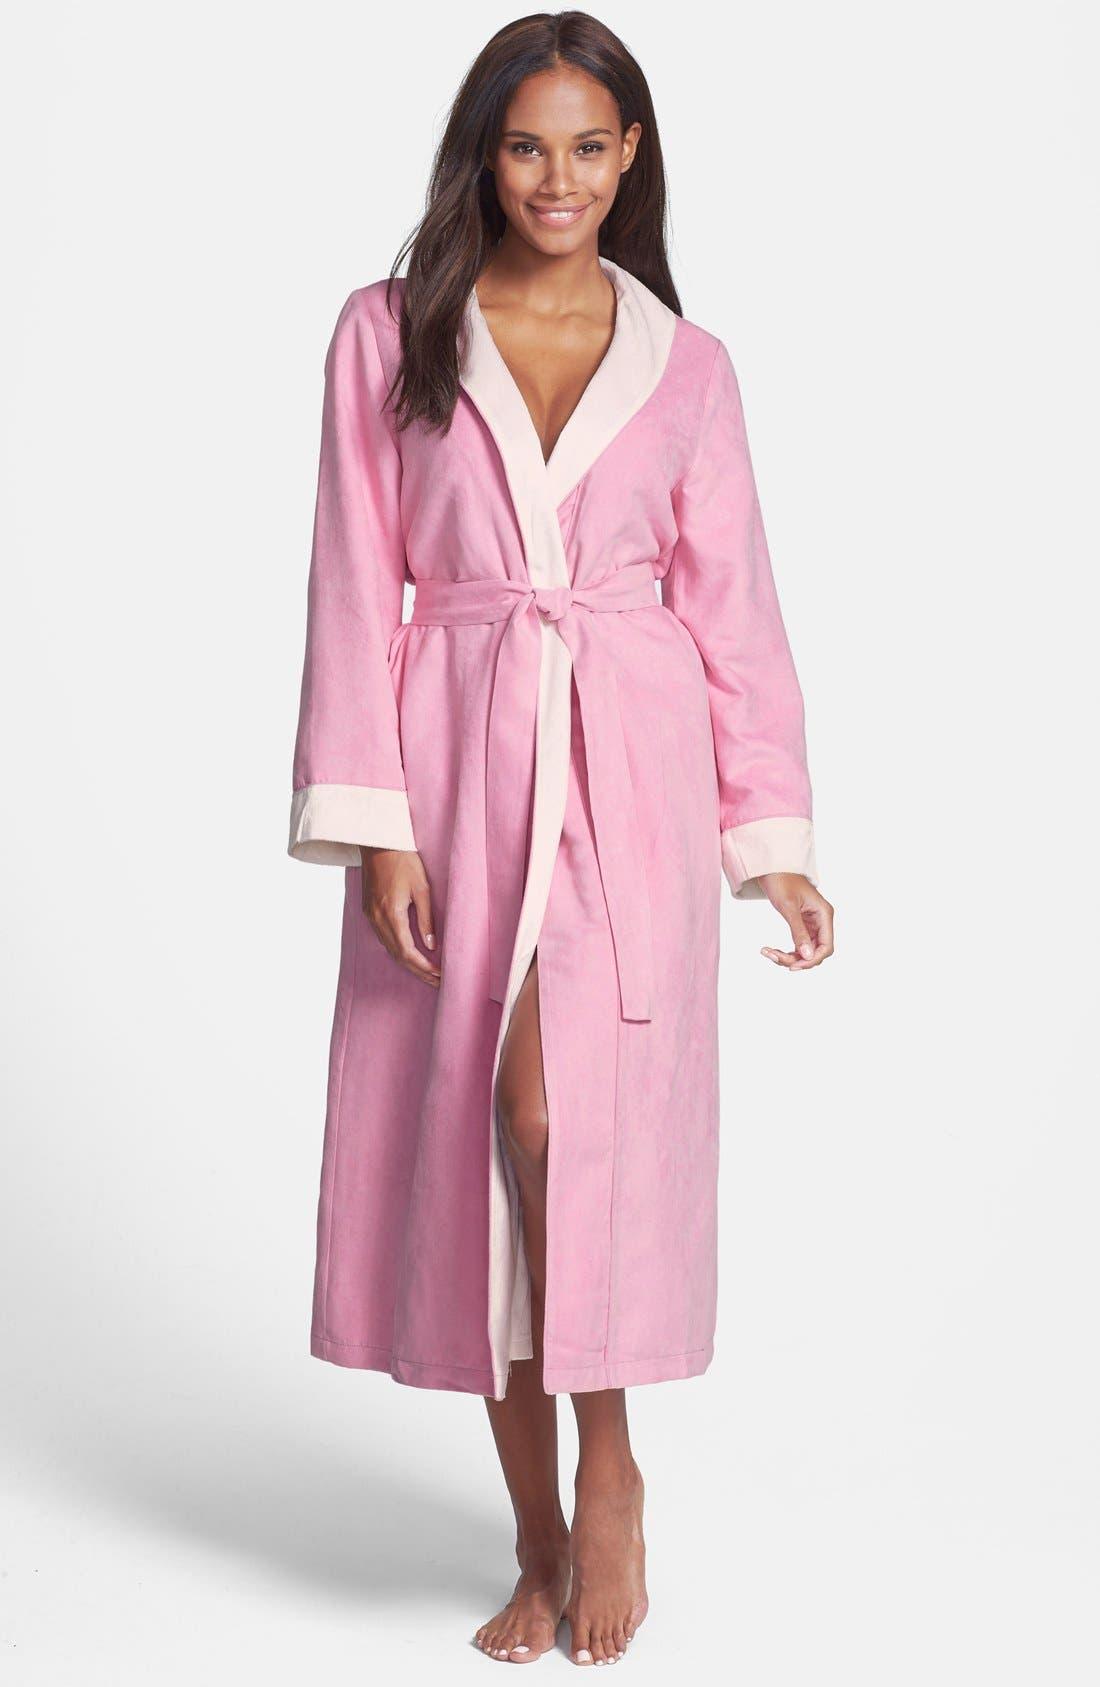 Alternate Image 1 Selected - Nordstrom 'Spa' Robe